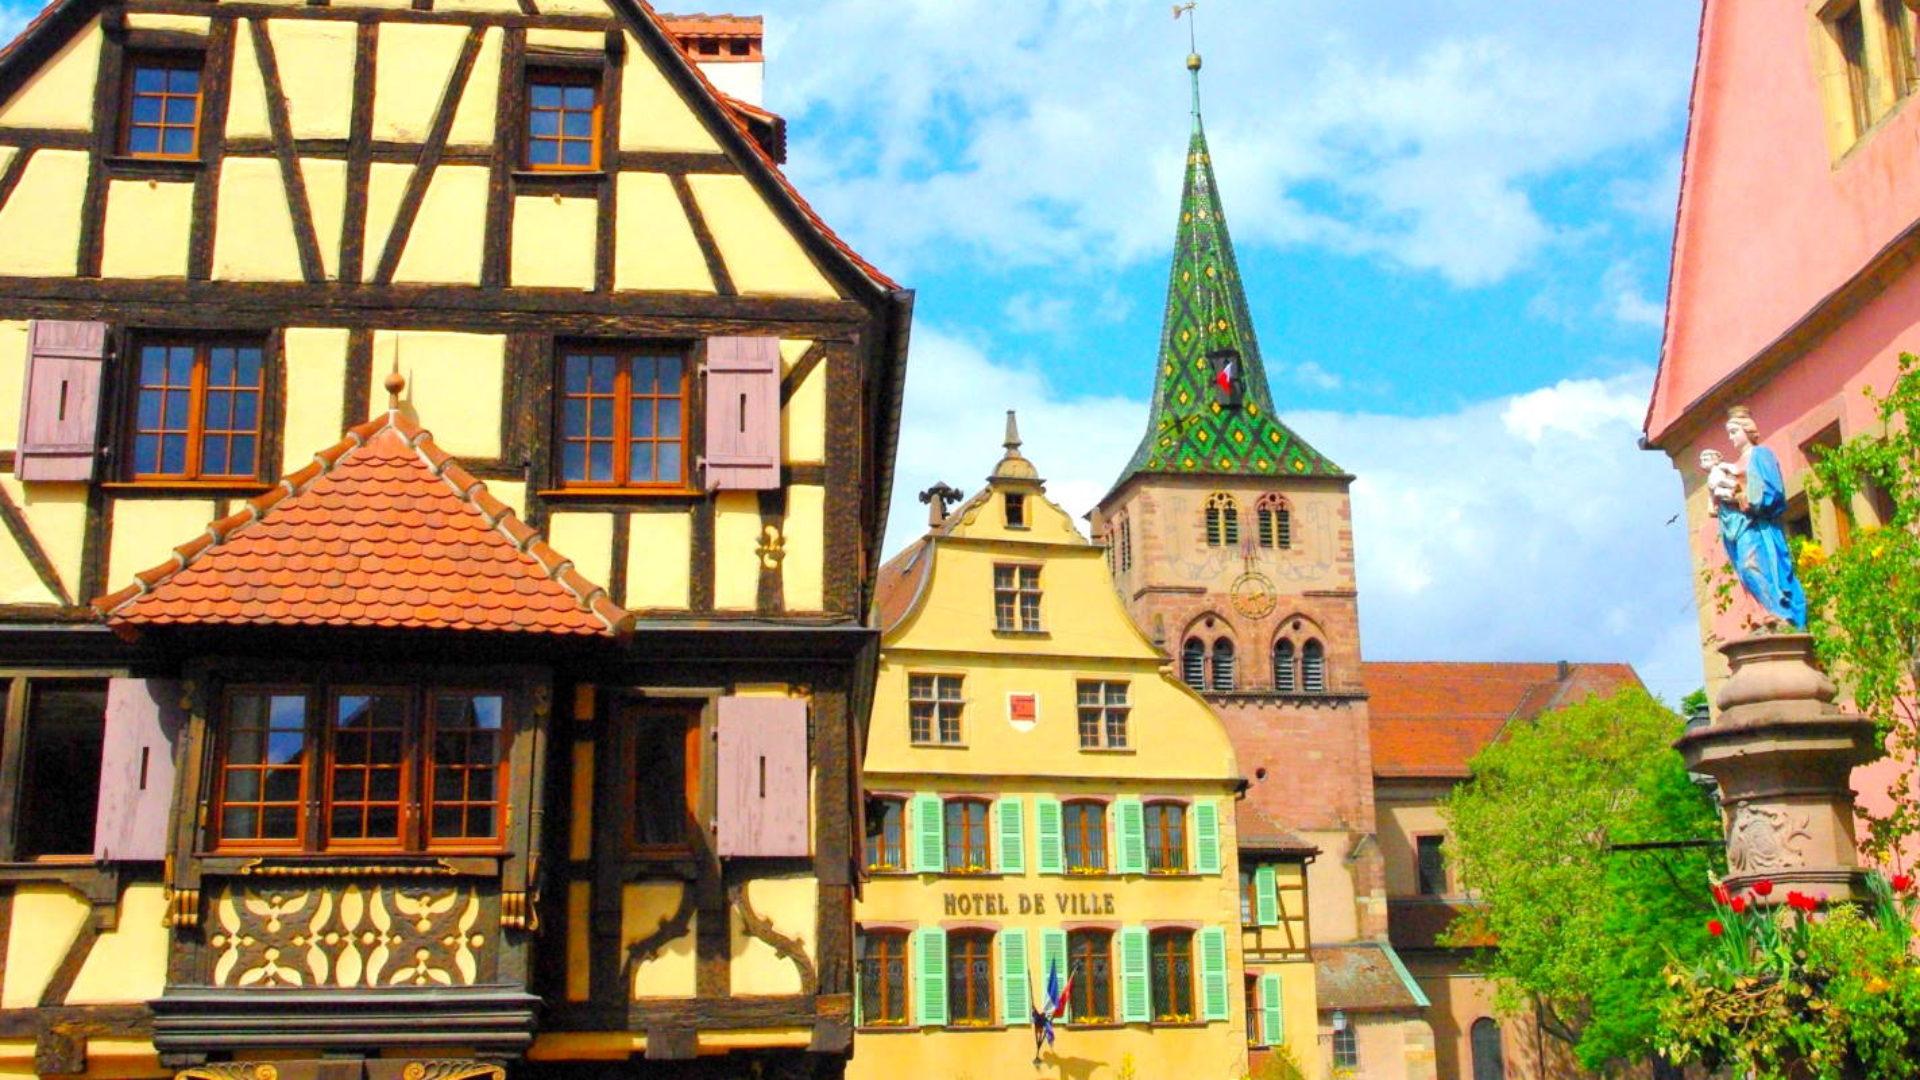 Bienvenue au Gîte Sainte-Anne à Turckheim Alsace